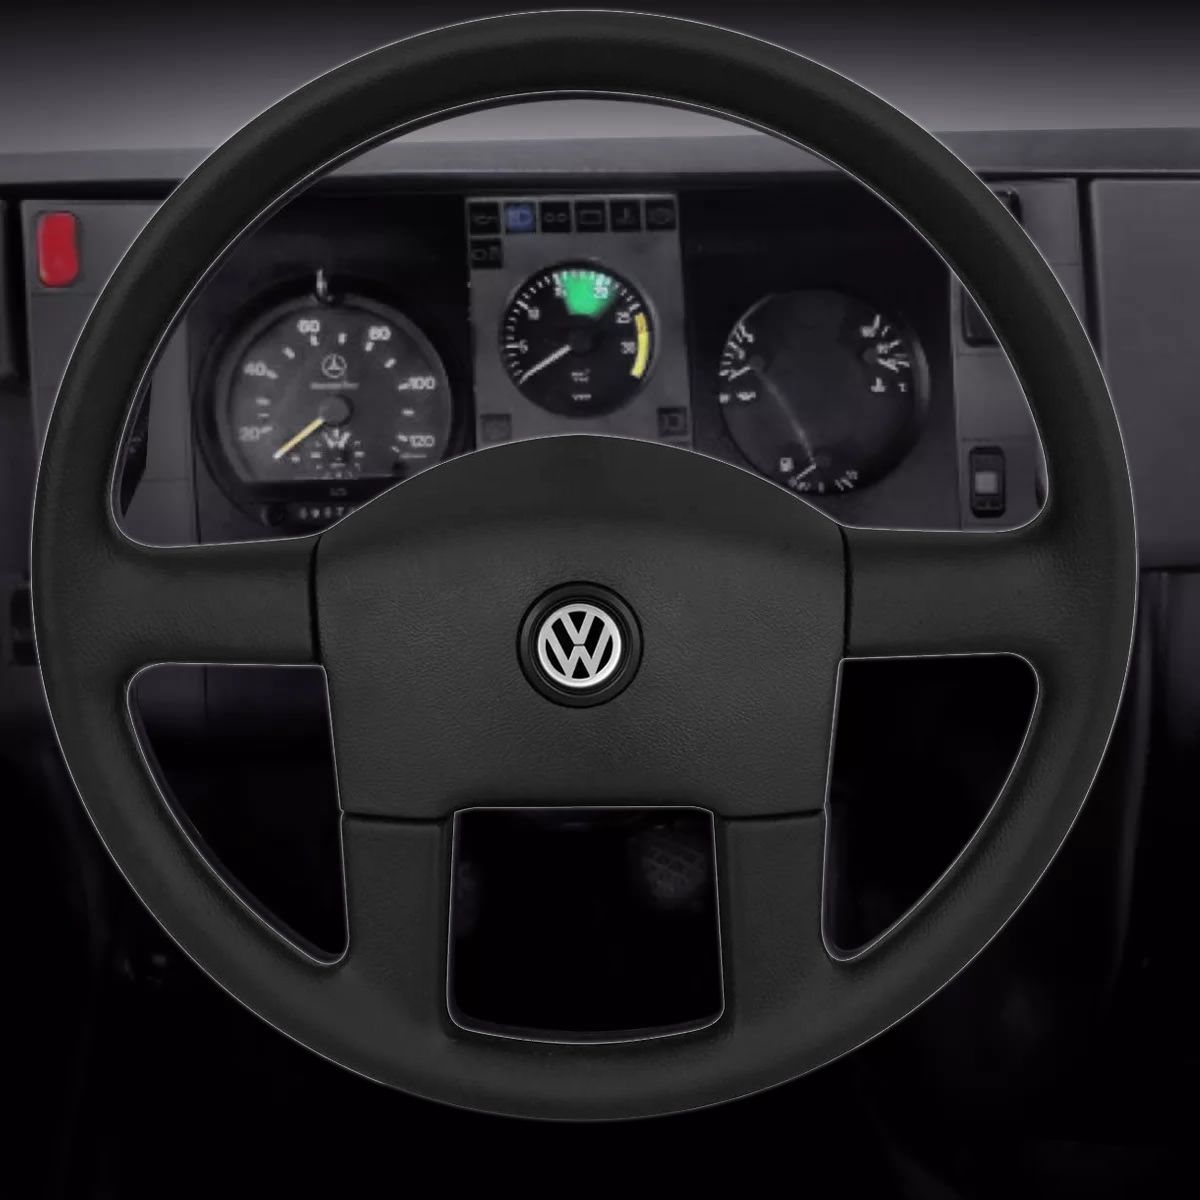 Volante Original Caminhão Constellation Volkswagen Vw